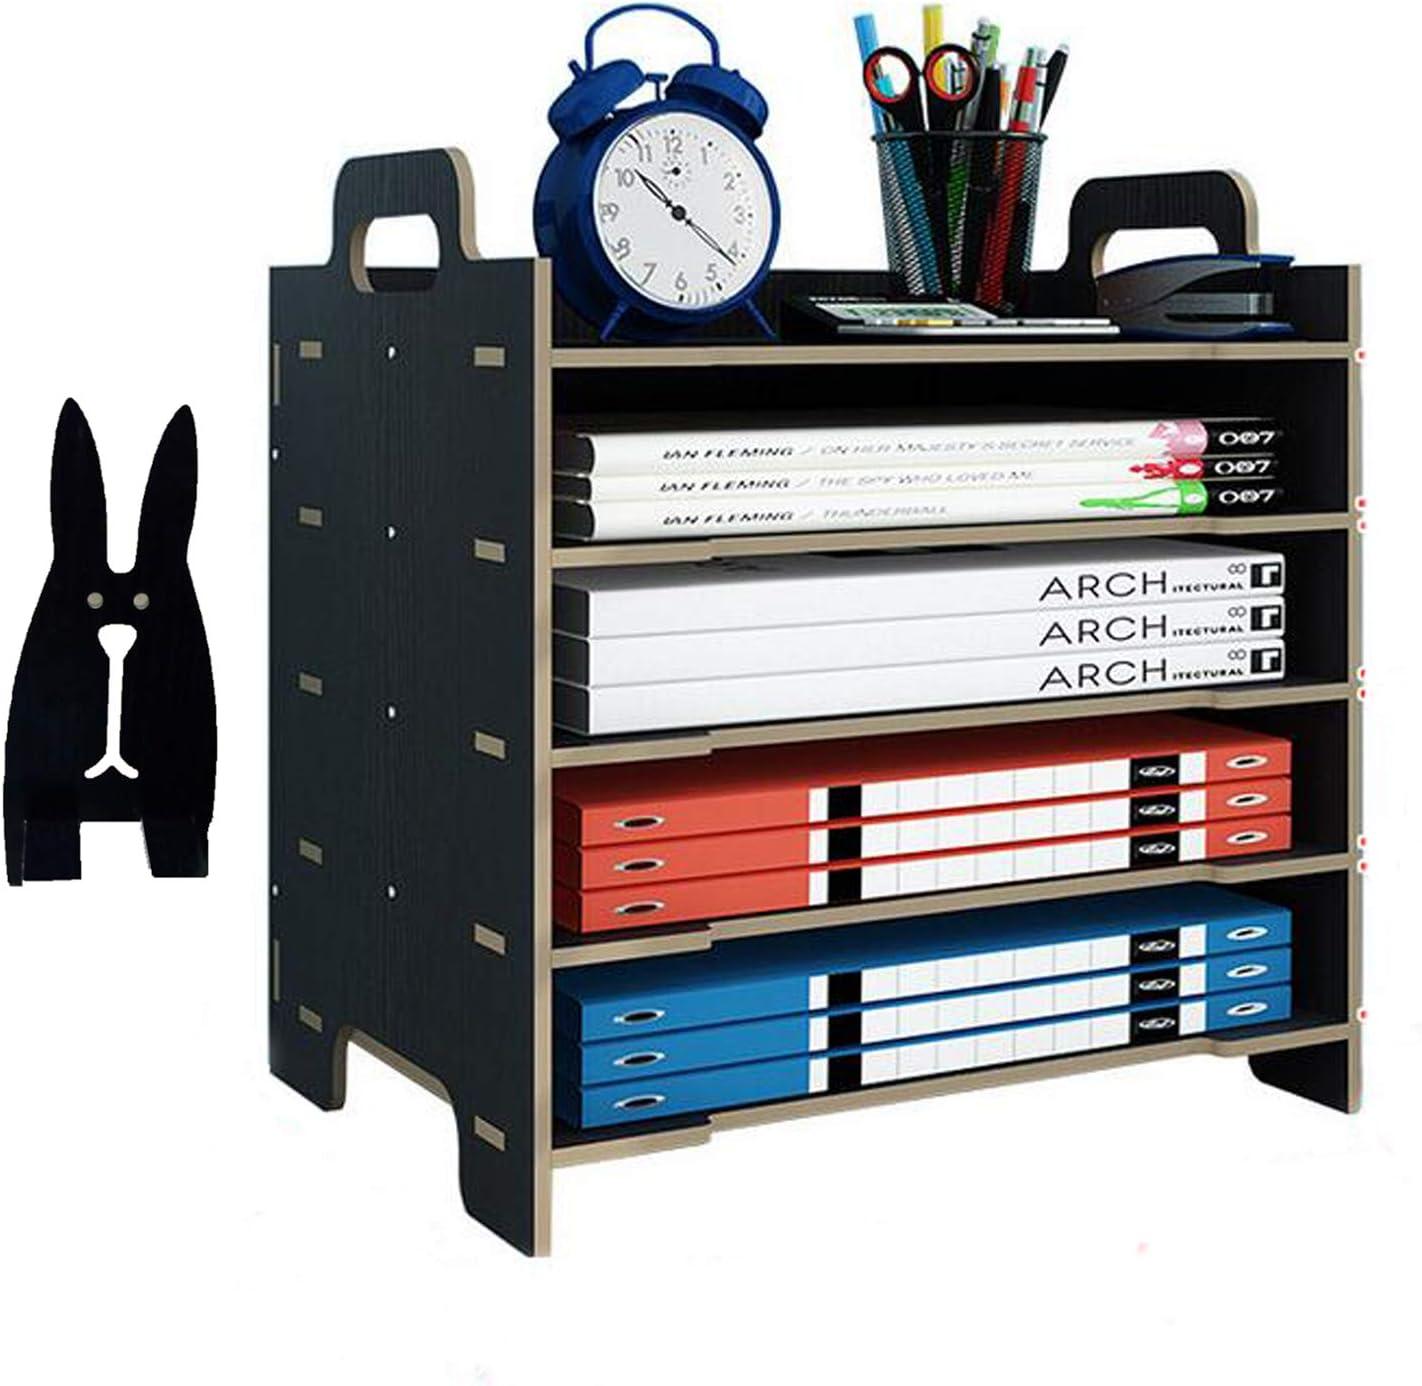 Marbrasse 5 Trays Wooden Desk File Organizer, Document Mail Paper Organizer Letter Tray Storage Shelf Sorter for Office Home Supplies (Black)